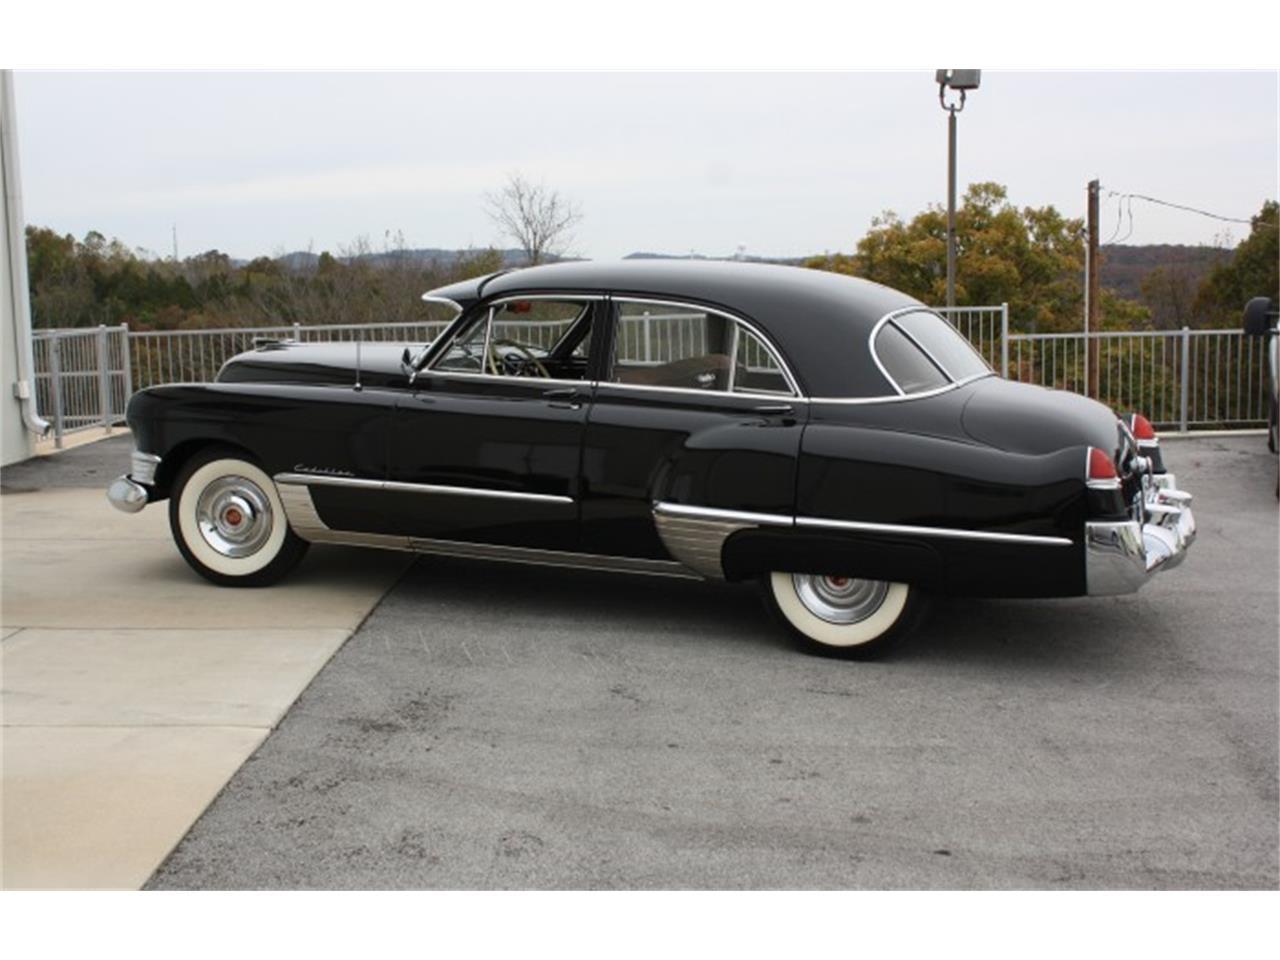 1949 Cadillac Series 62 - Branson Auto & Farm Museum